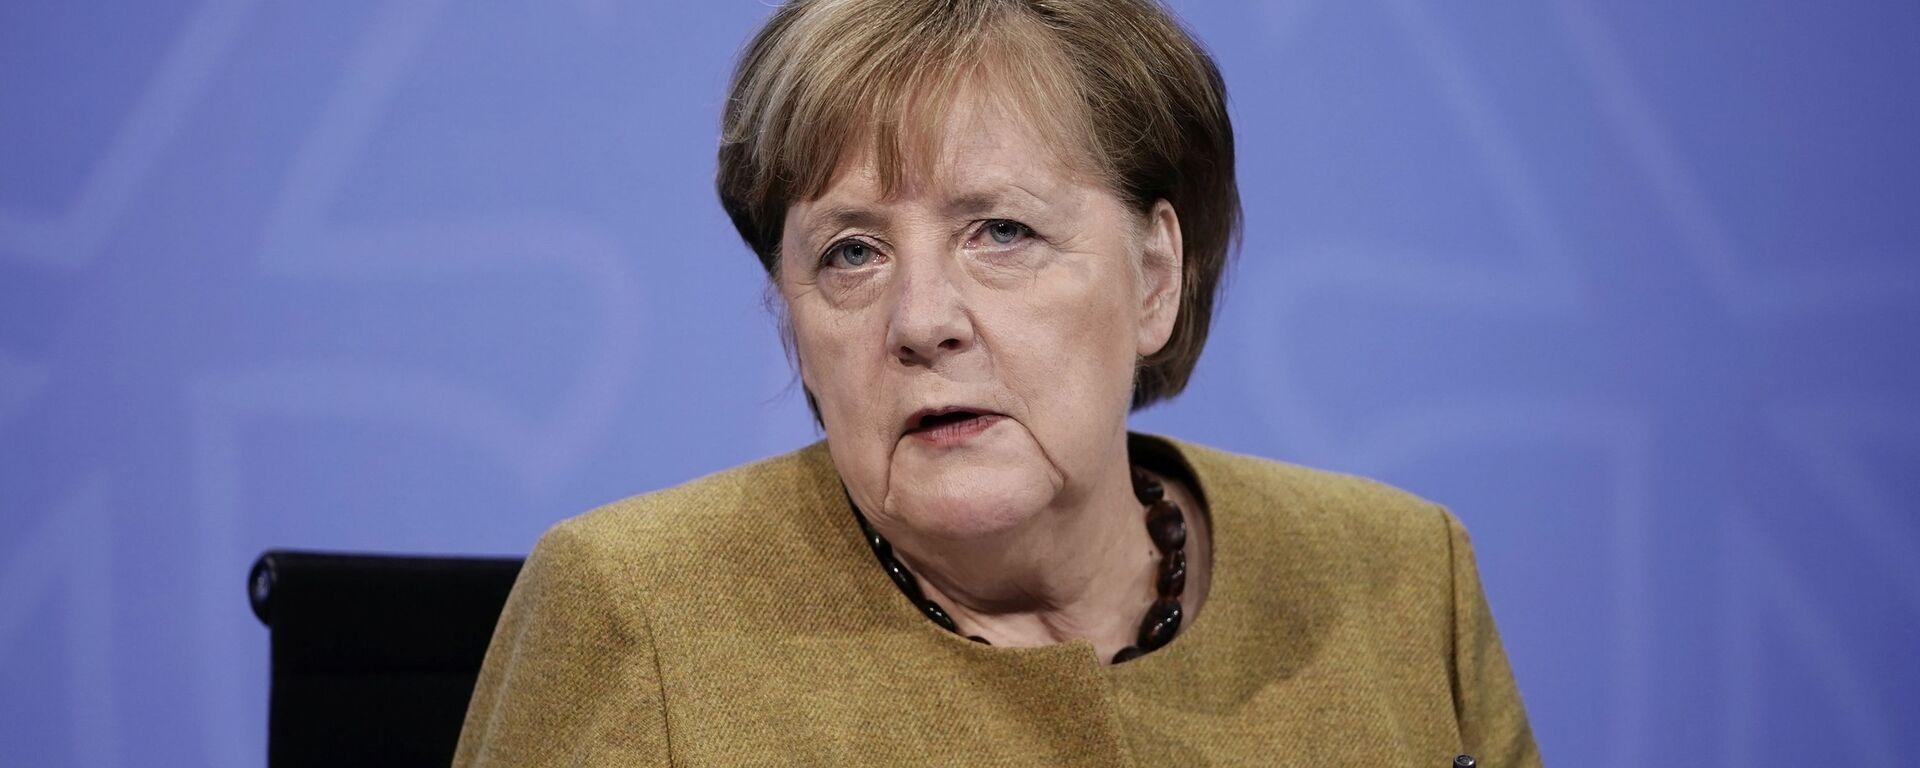 Angela Merkel, canciller alemana - Sputnik Mundo, 1920, 17.01.2021